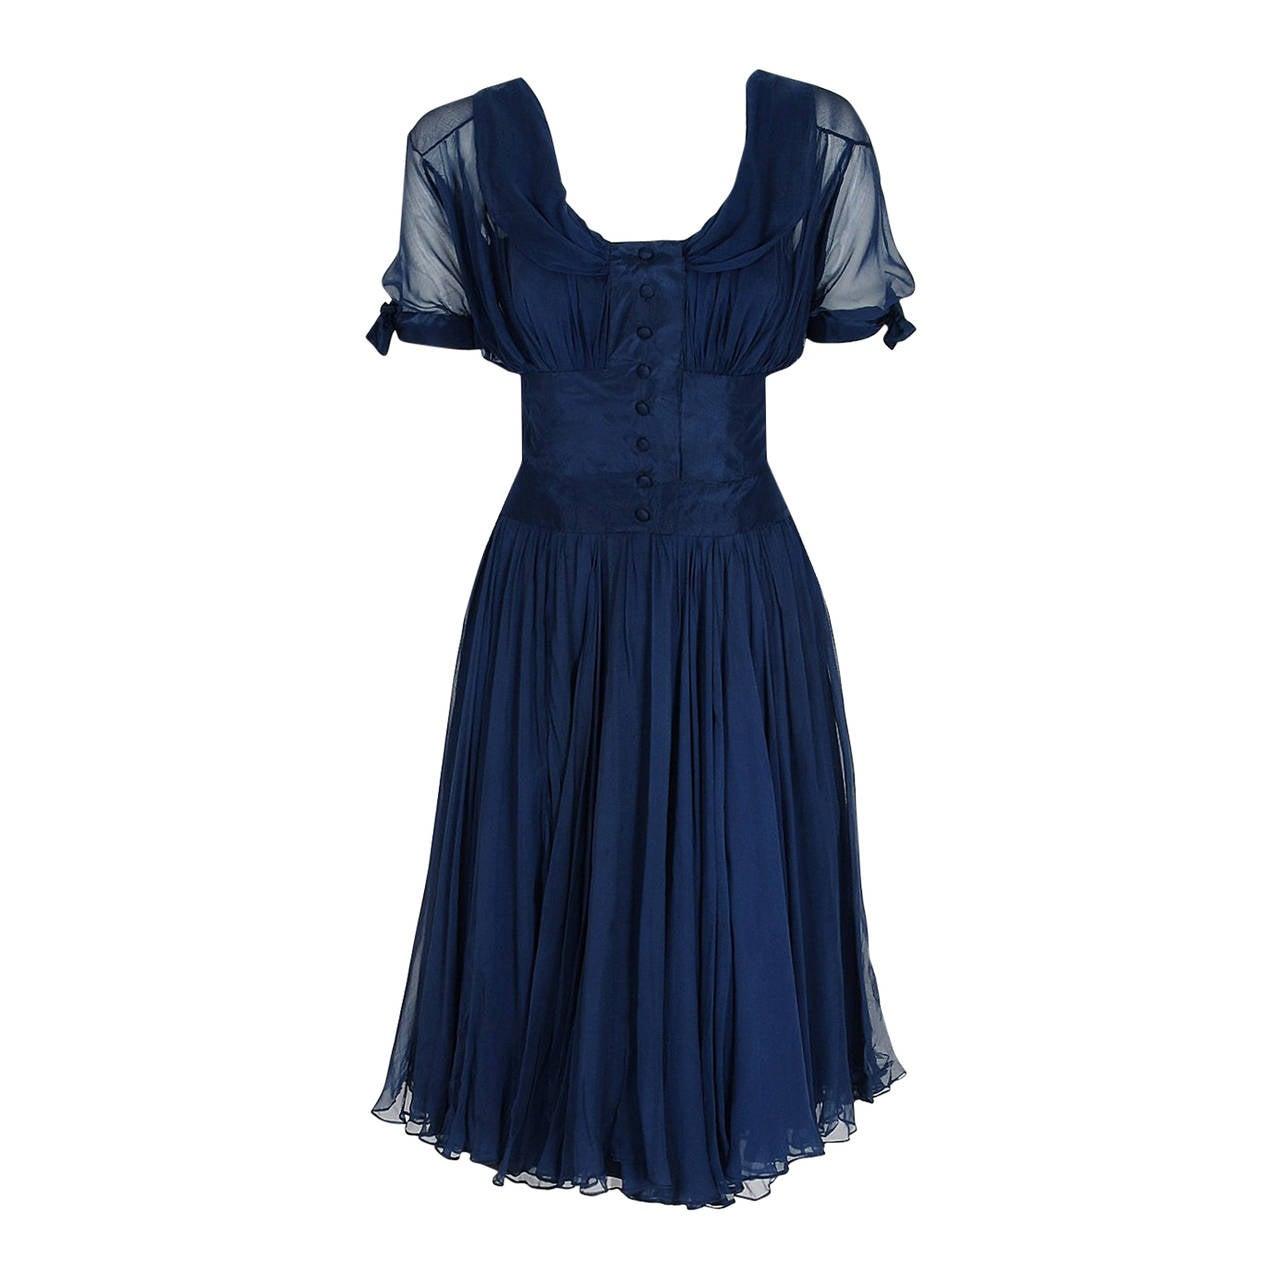 1955 Jean Desses Haute-Couture Sculpted Navy Blue Silk Shelf-Bust Party Dress 1